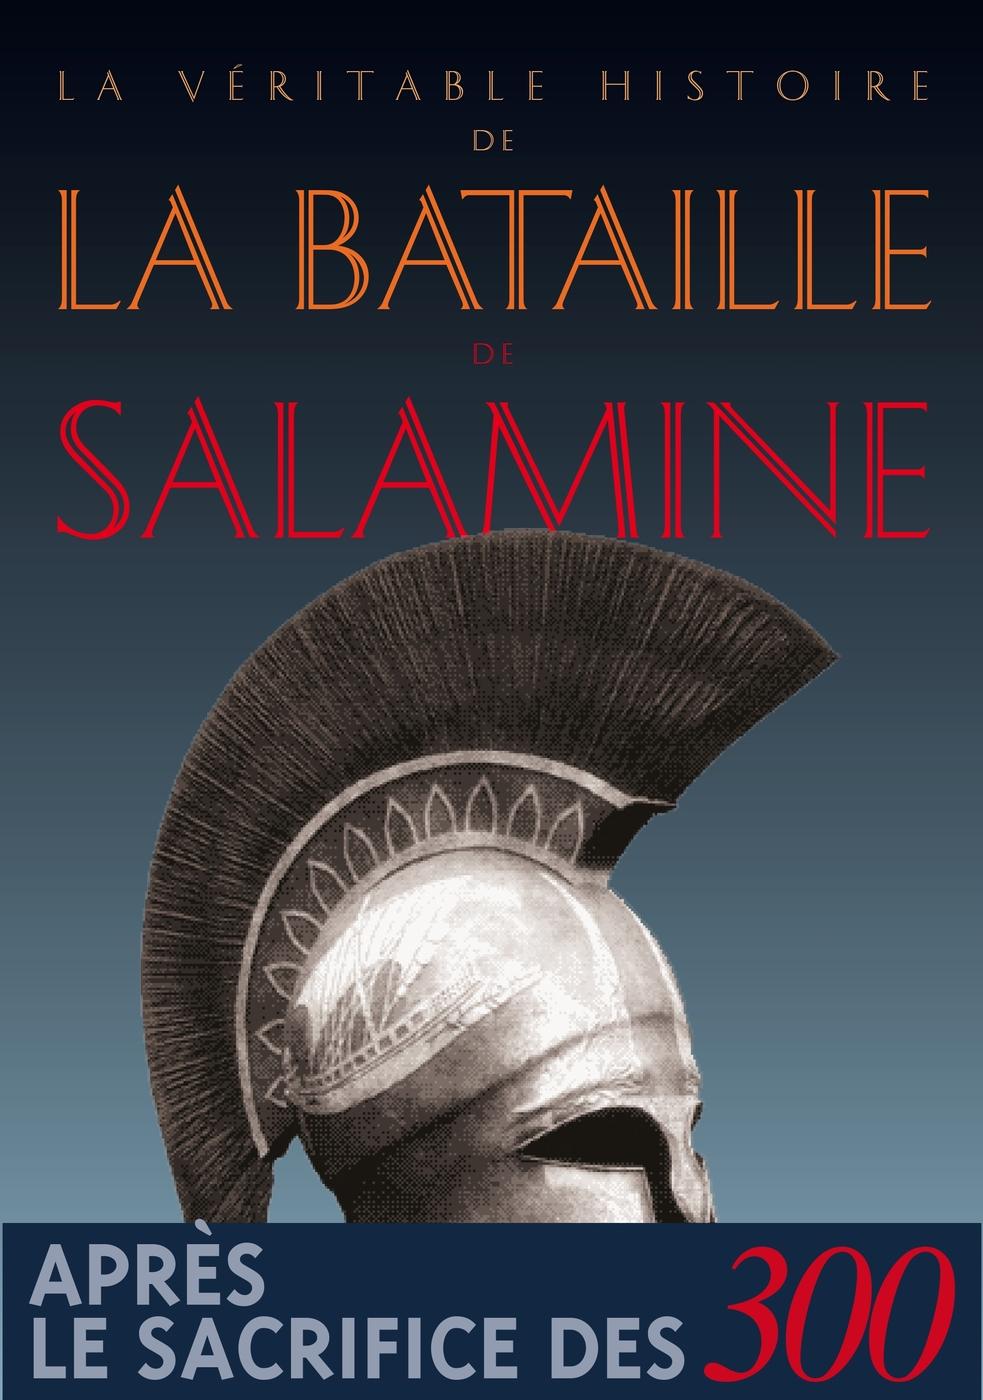 Malye, La Véritable Histoire de la bataille de Salamine